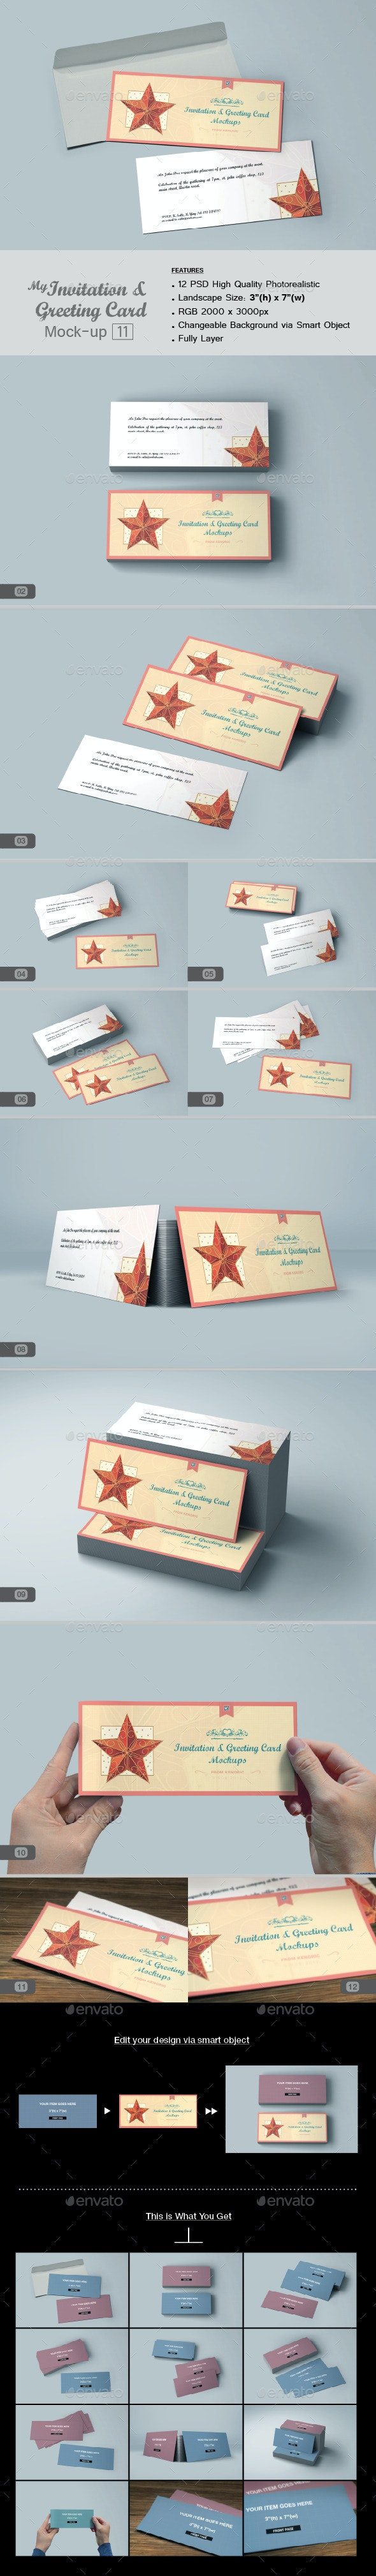 myGreeting Card Mock-up v11 - Print Product Mock-Ups